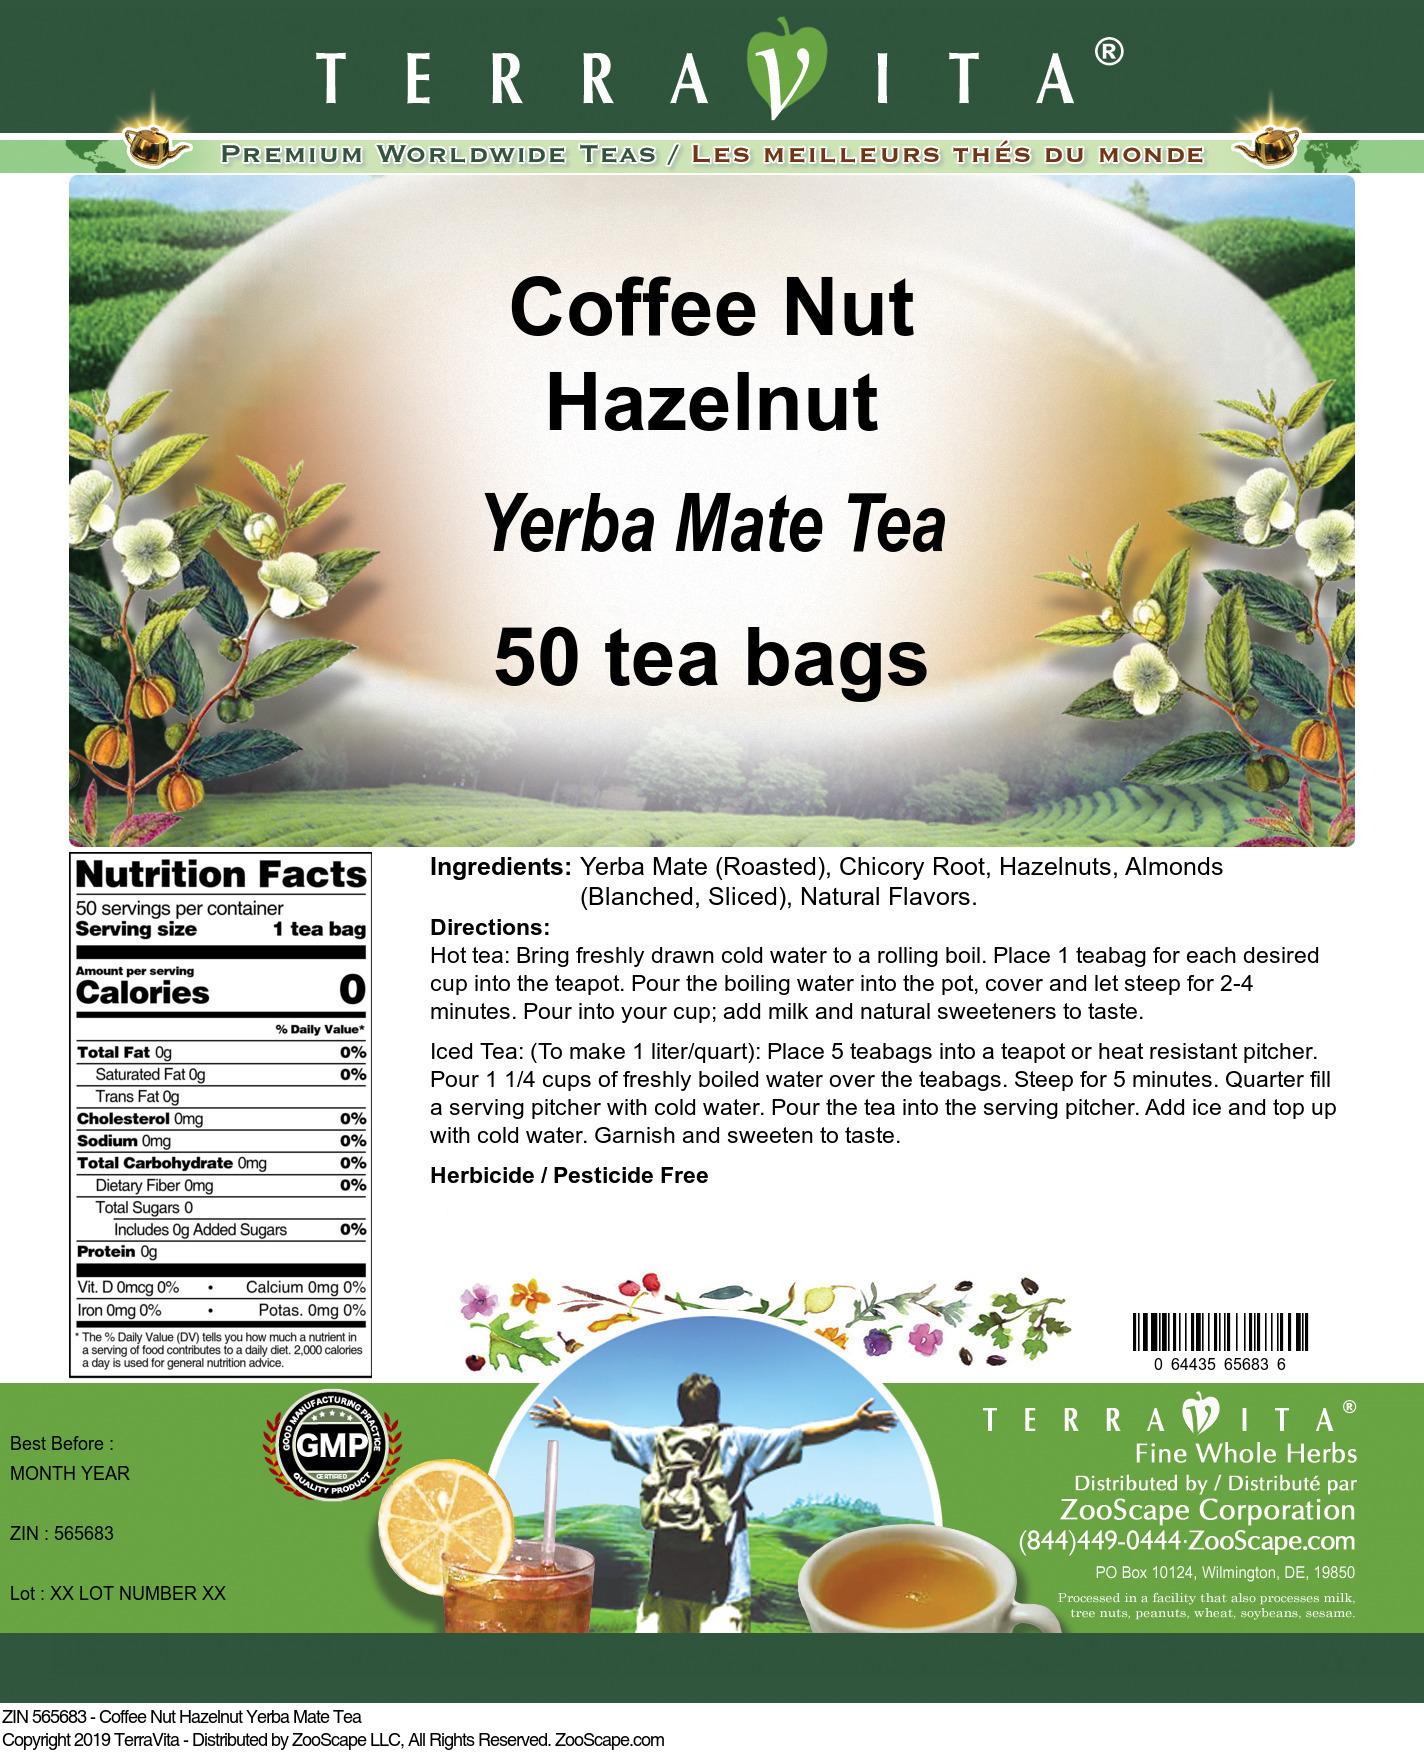 Coffee Nut Hazelnut Yerba Mate Tea